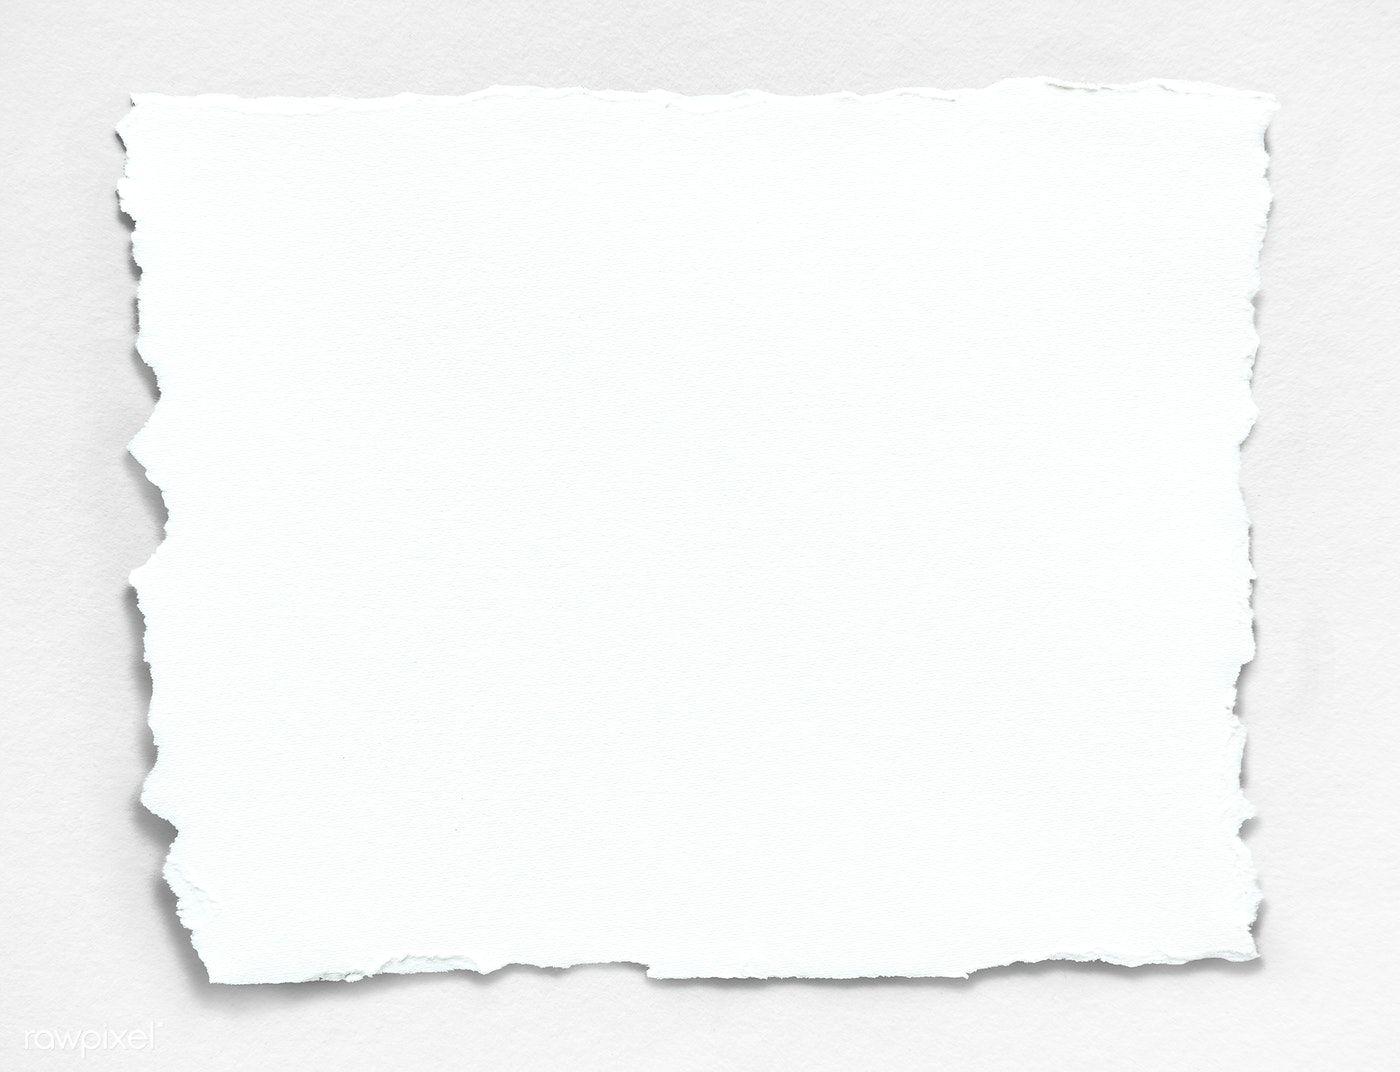 Download Premium Psd Of Blank Torn White Paper Template 1201994 Papel Rasgado Ideias Png